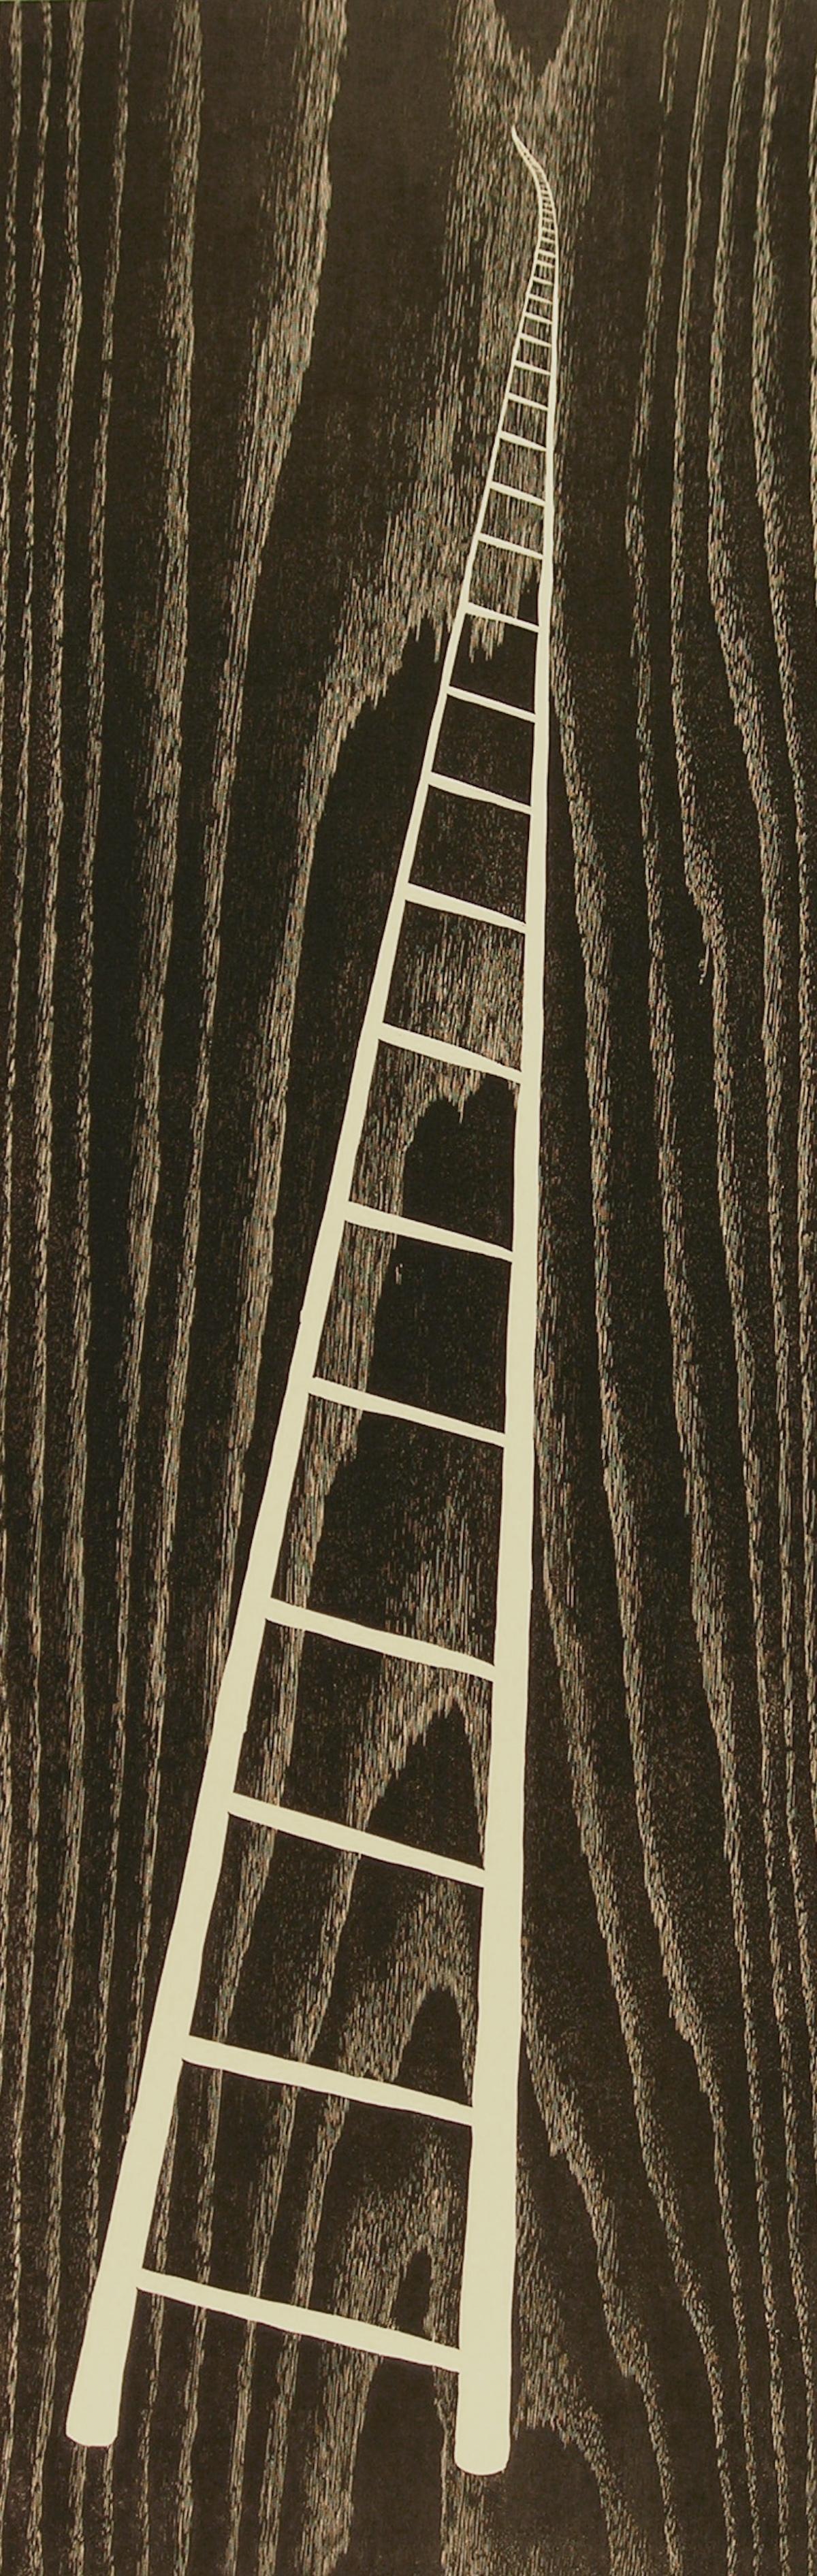 White Ladder by Betty Scarpino